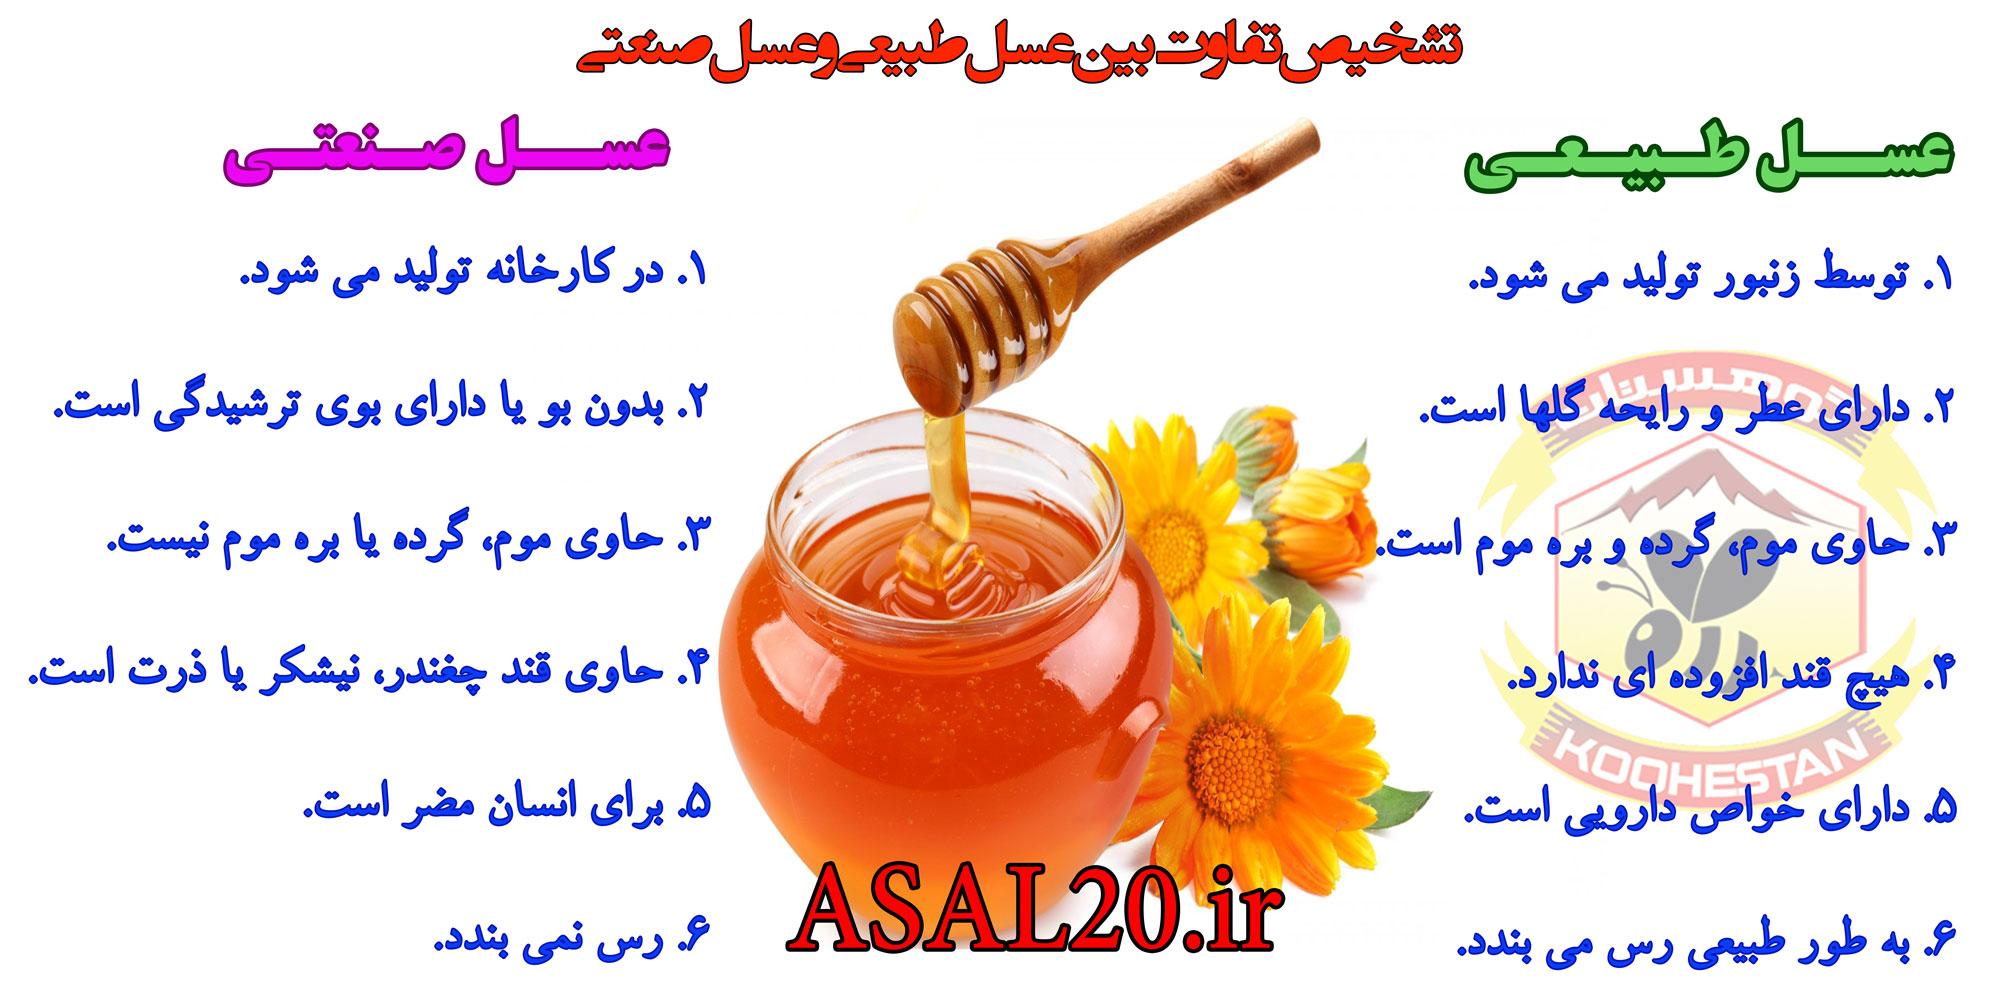 تفاوت عسل اصلی با تقلبی . فرق عسل طبیعی و تقلبی